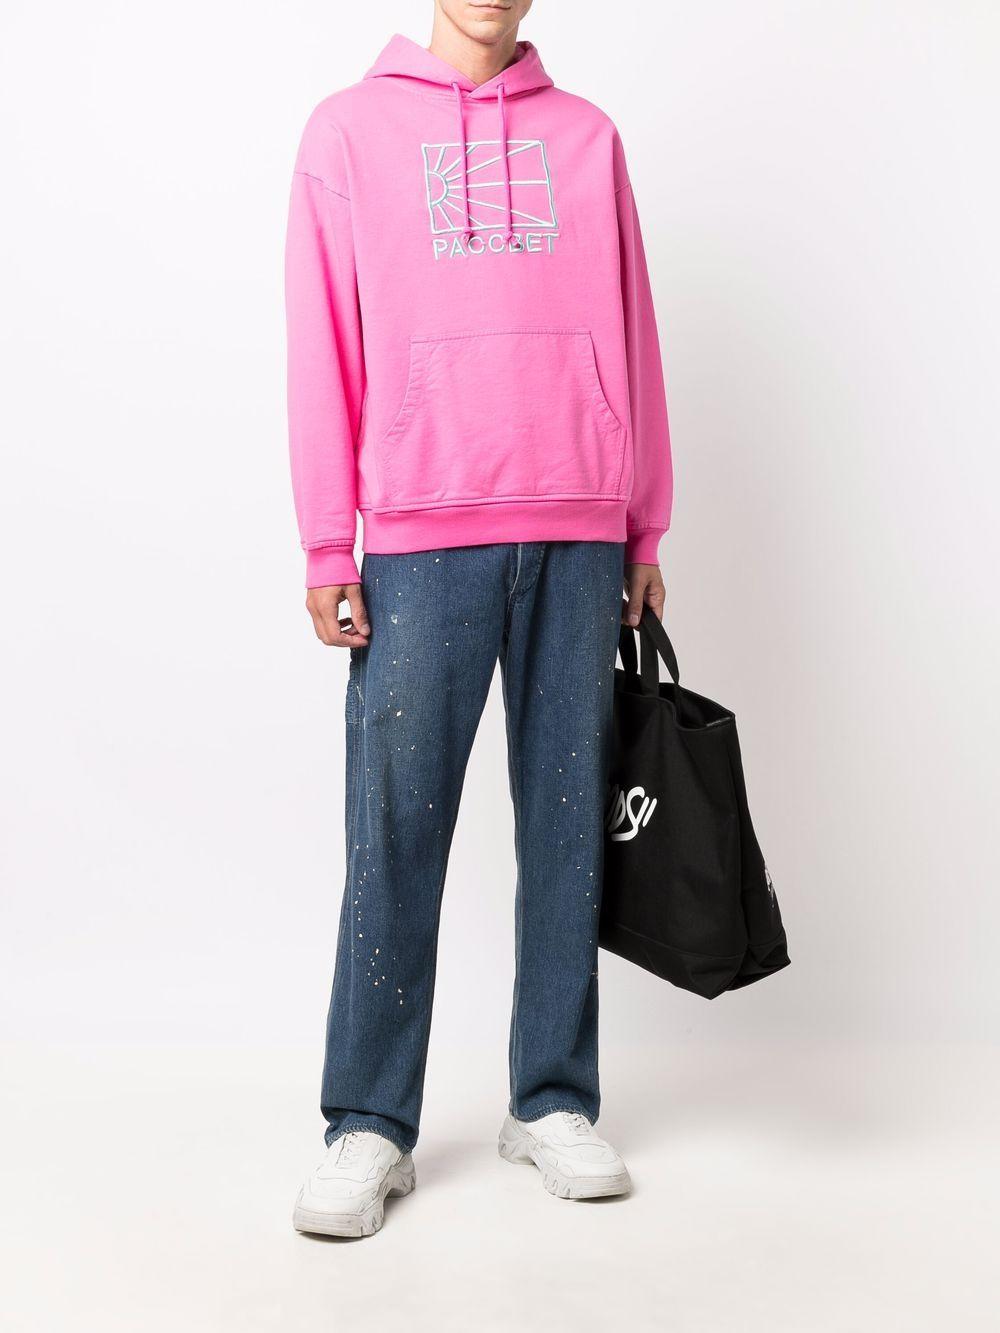 felpa con logo uomo rosa in cotone RASSVET   Felpe   PACC9T0253